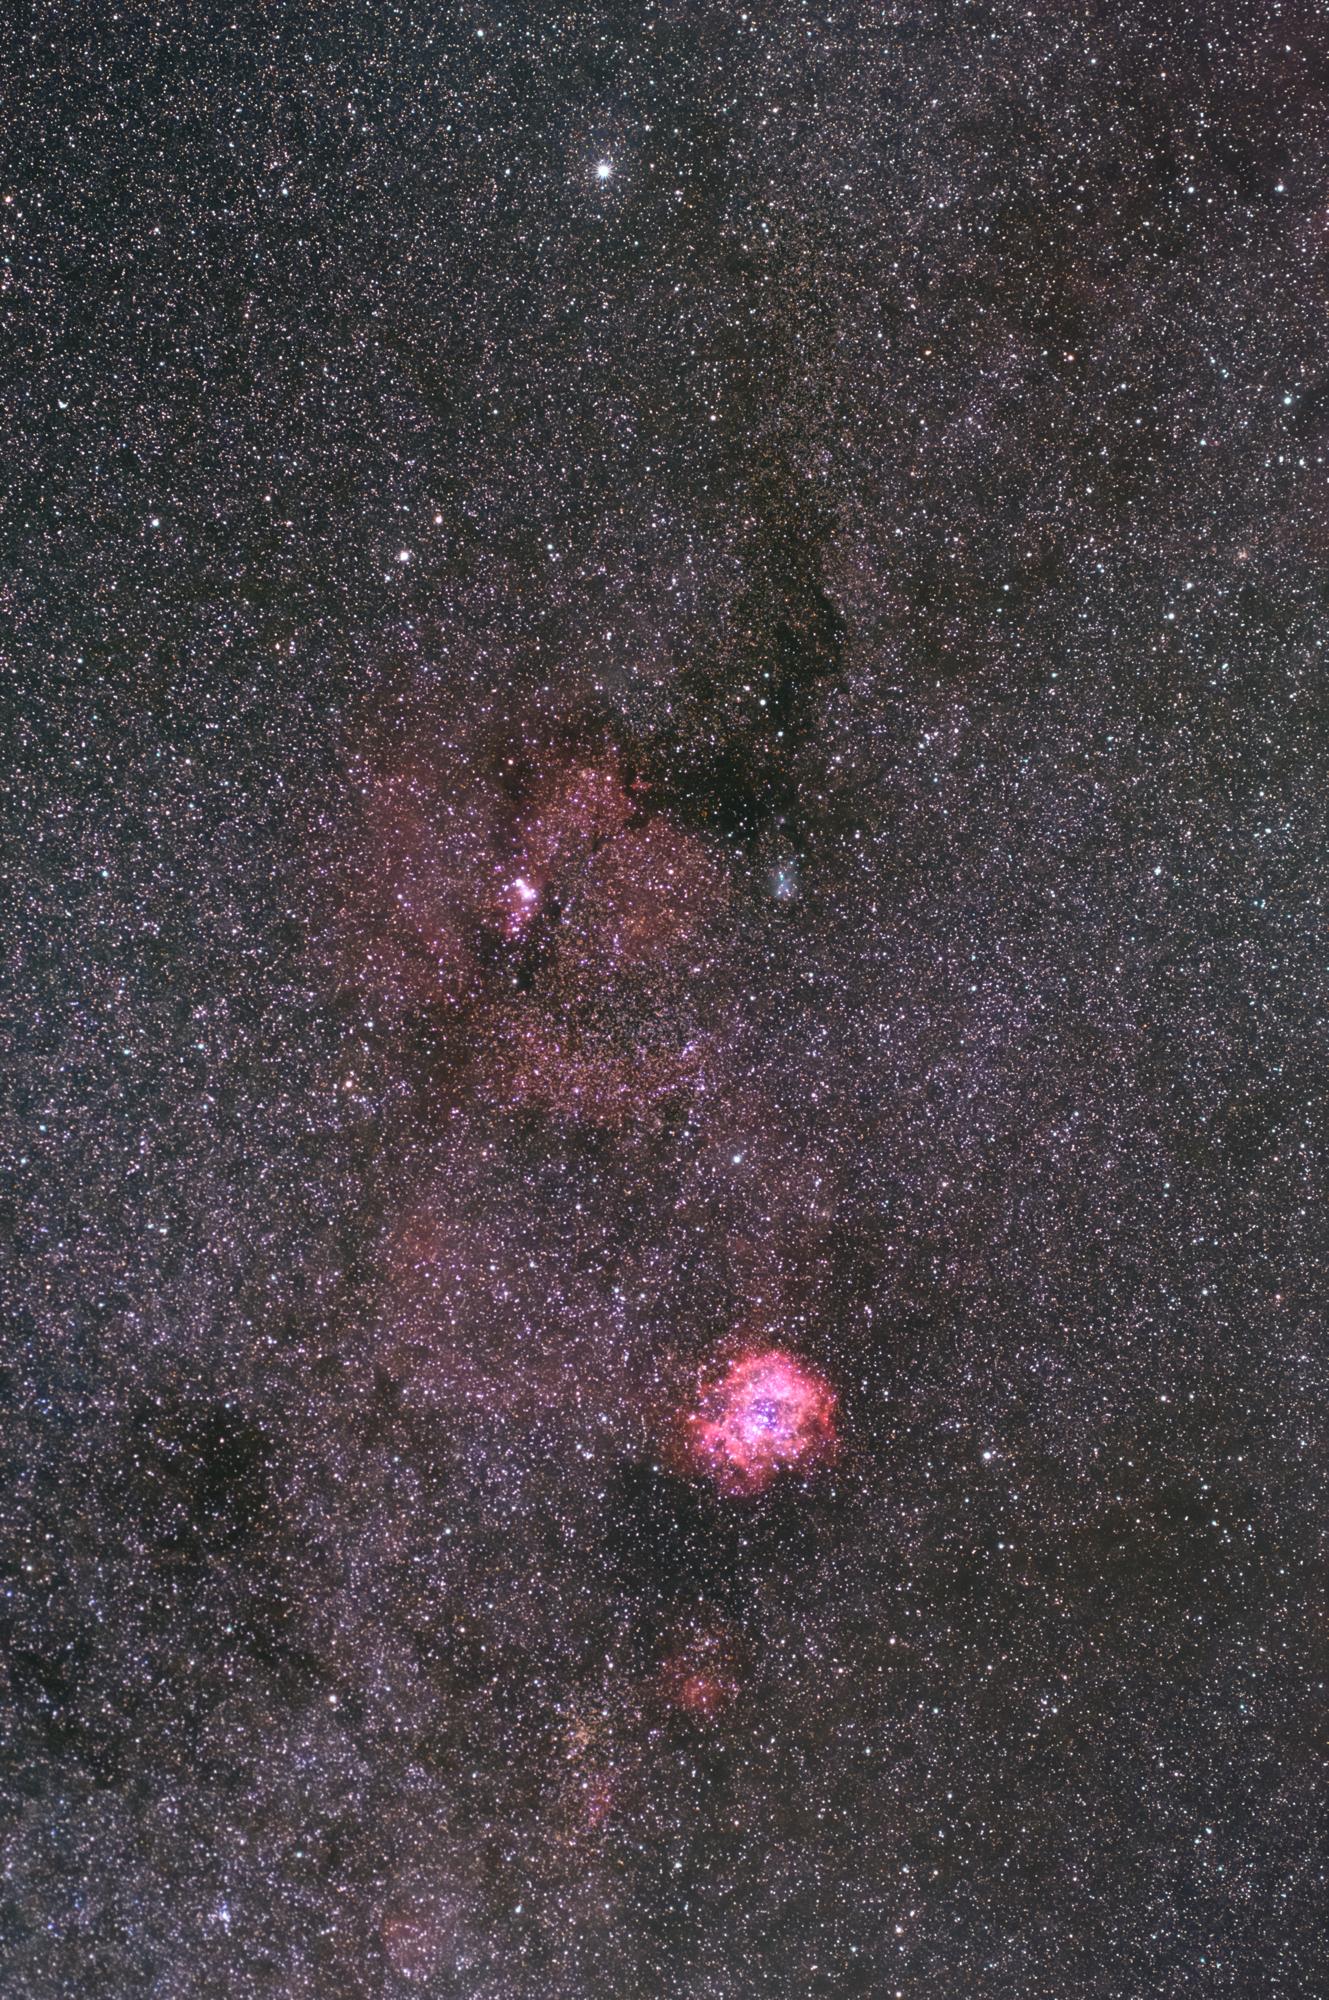 f:id:snct-astro:20180101152843j:plain